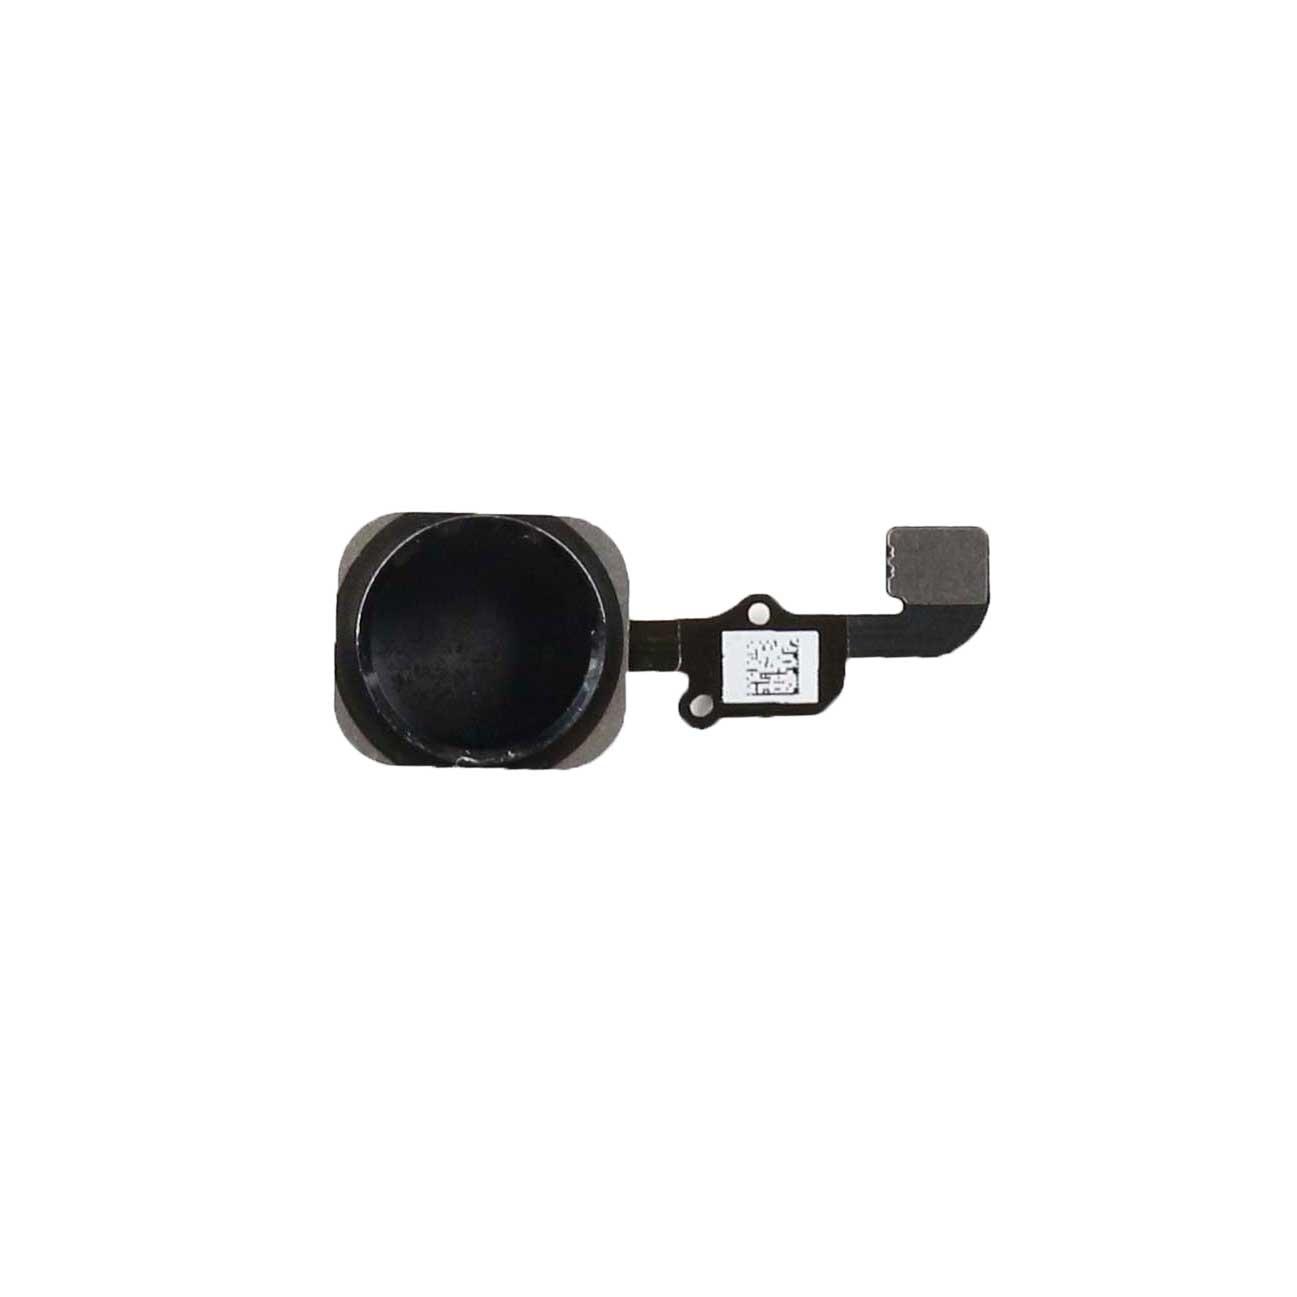 best service f9701 bda9a iPhone 6 / 6 Plus Home Button Flex - Black - Standard Quality